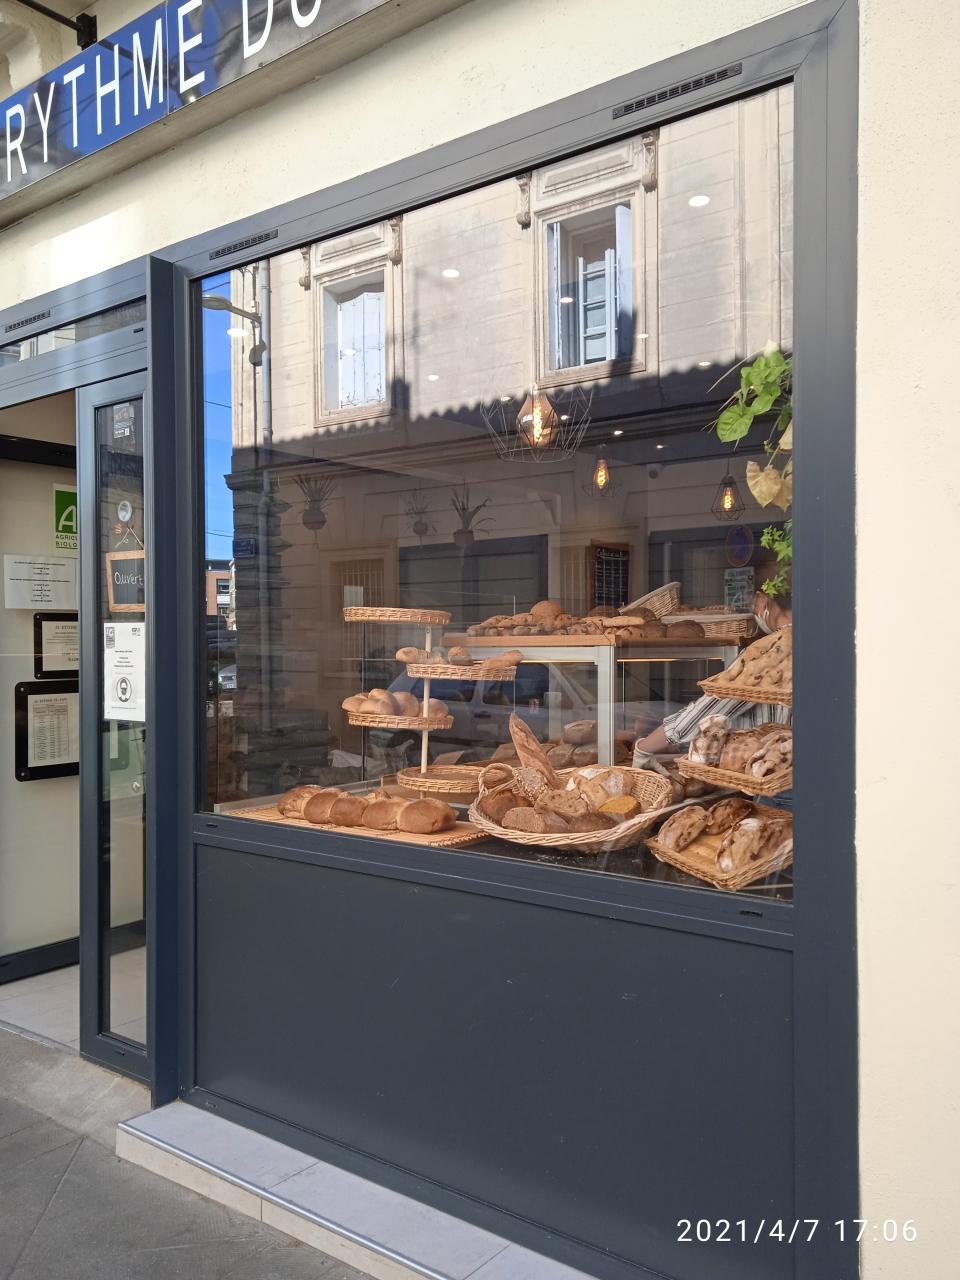 Cửa hiệu bánh mỳ baguette